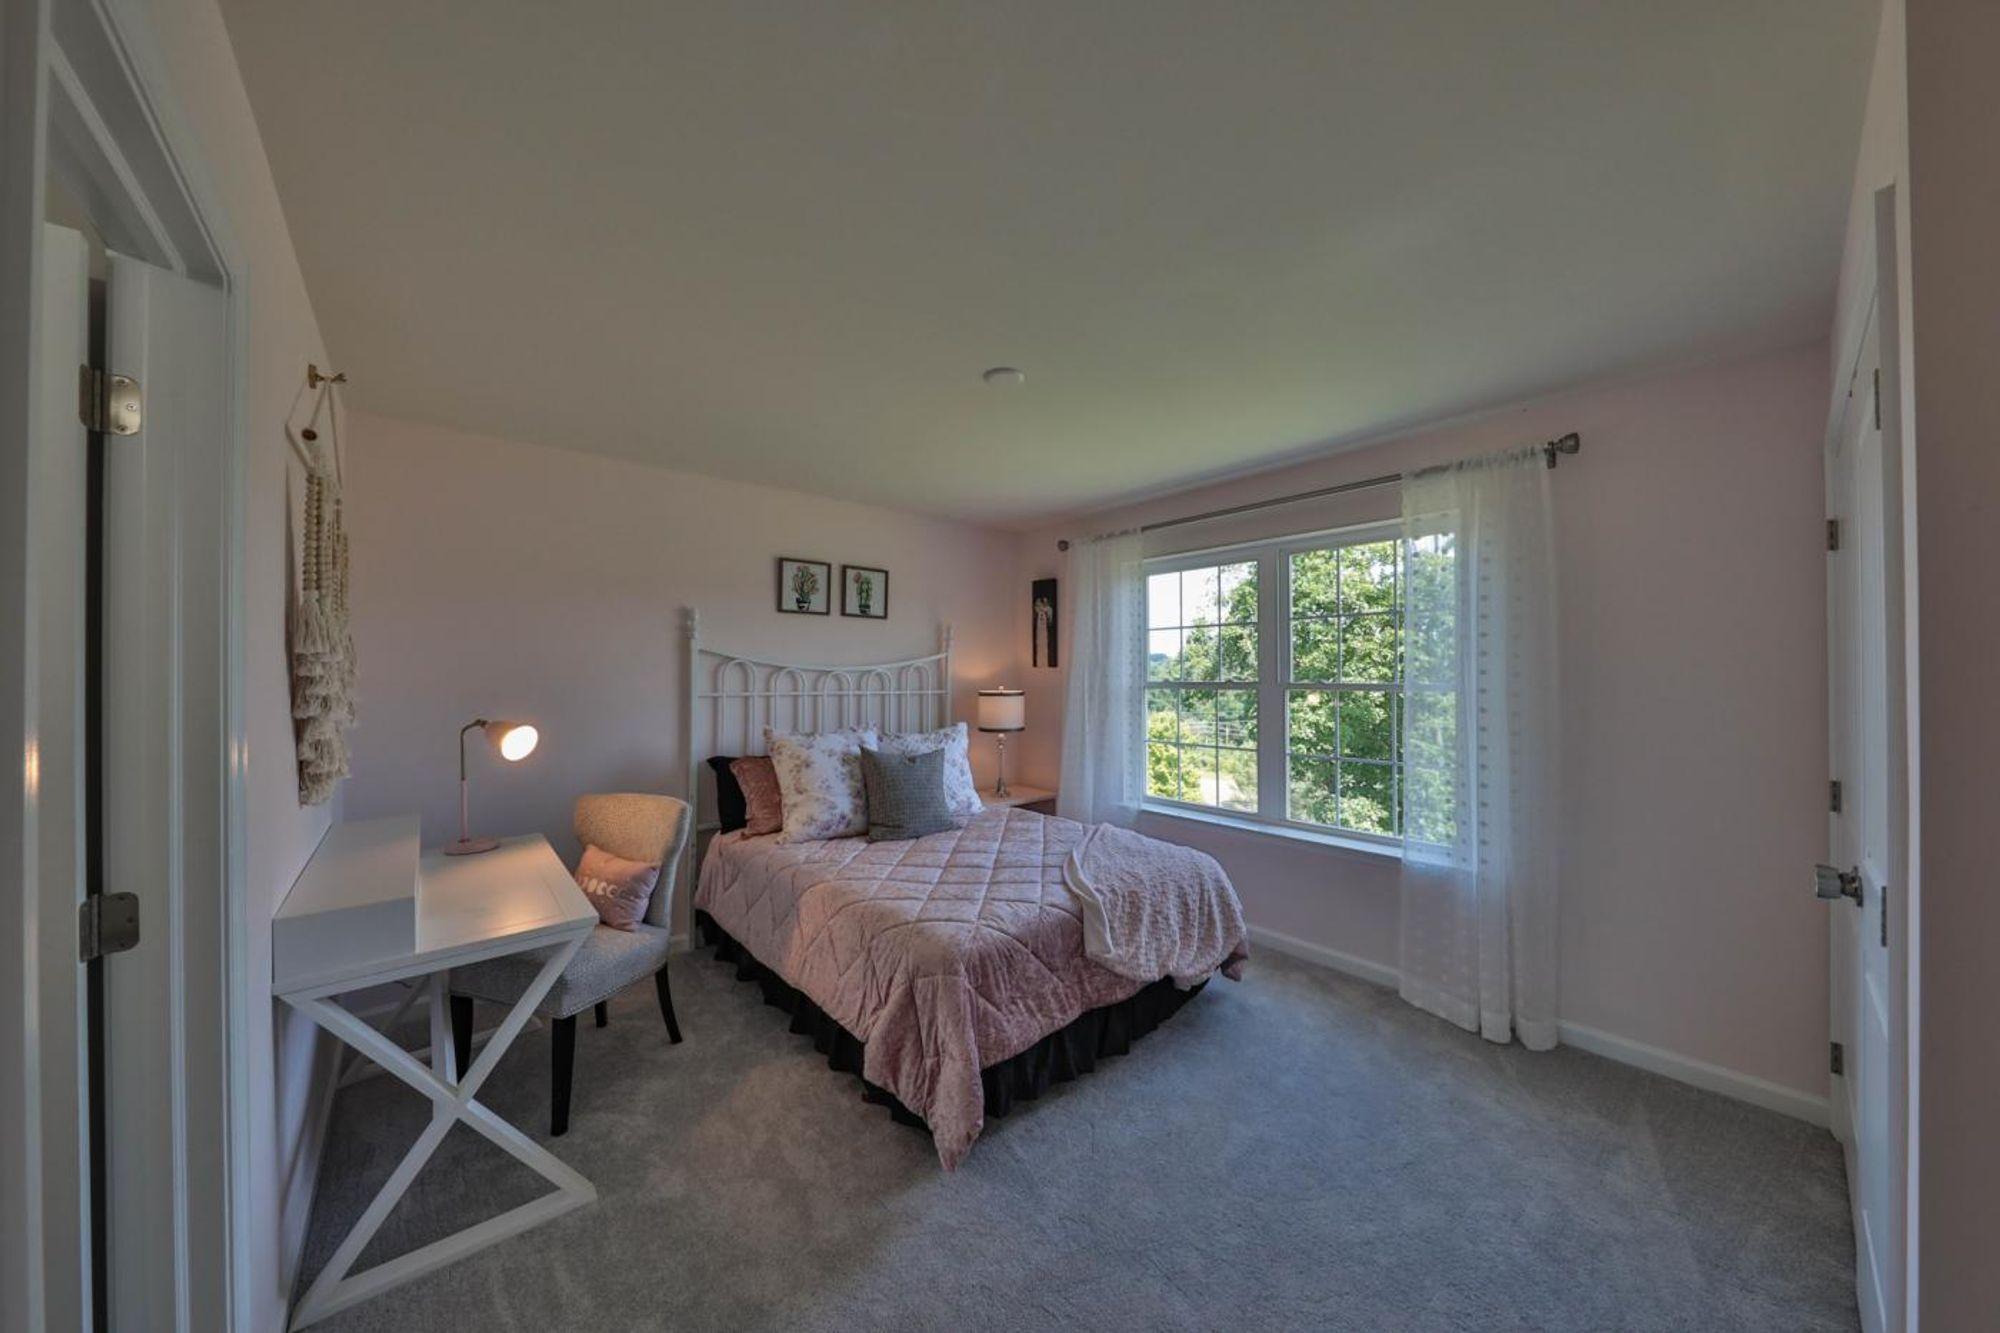 Bedroom featured in the Bentley 3 Car Garage By Kay Builders in Allentown-Bethlehem, PA